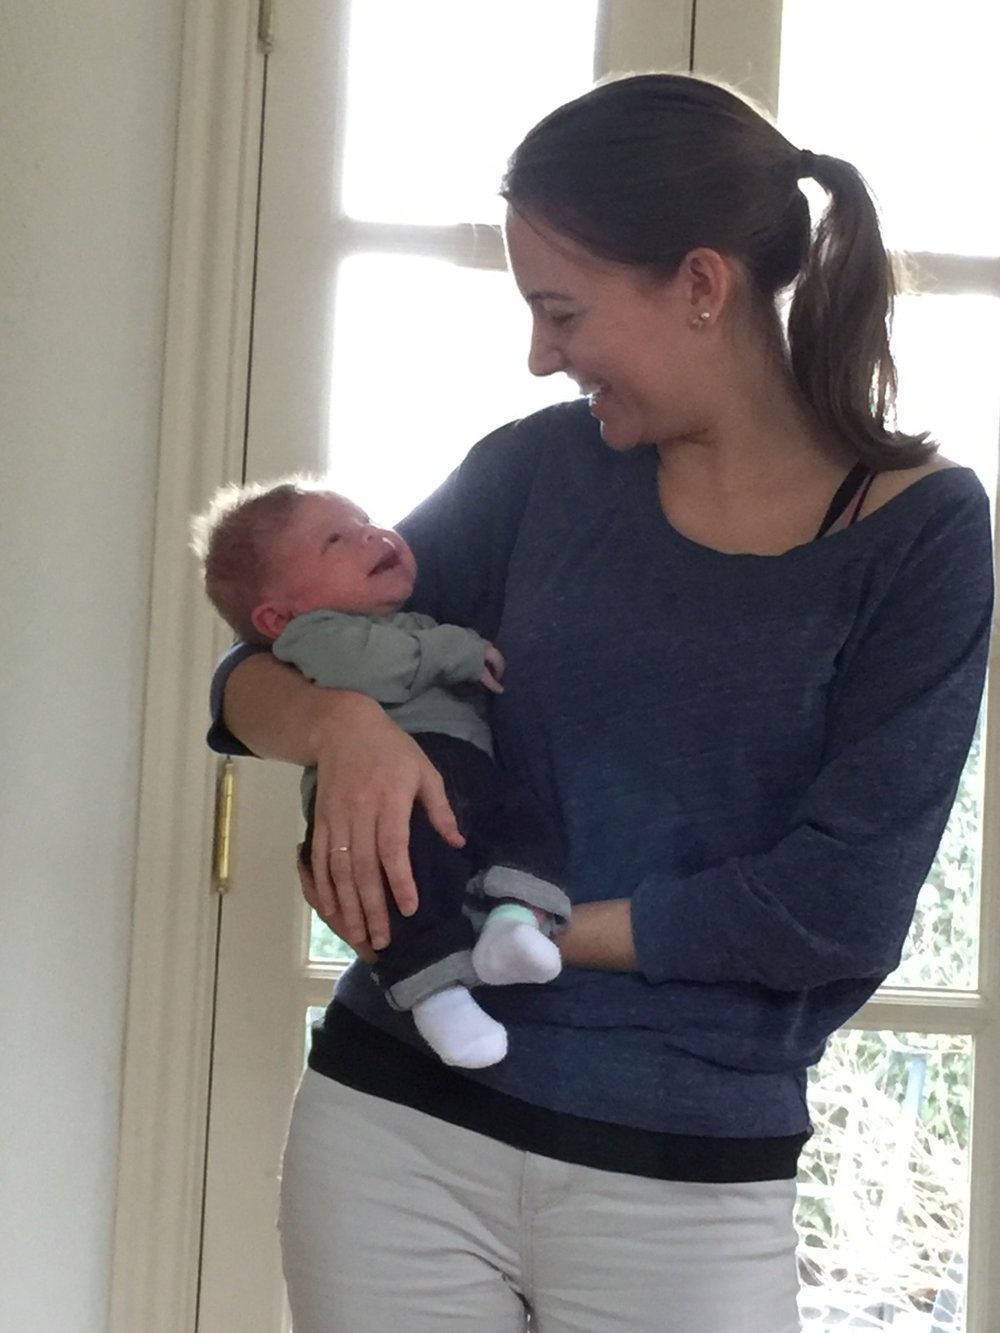 Nikki holding baby DC area postpartum support